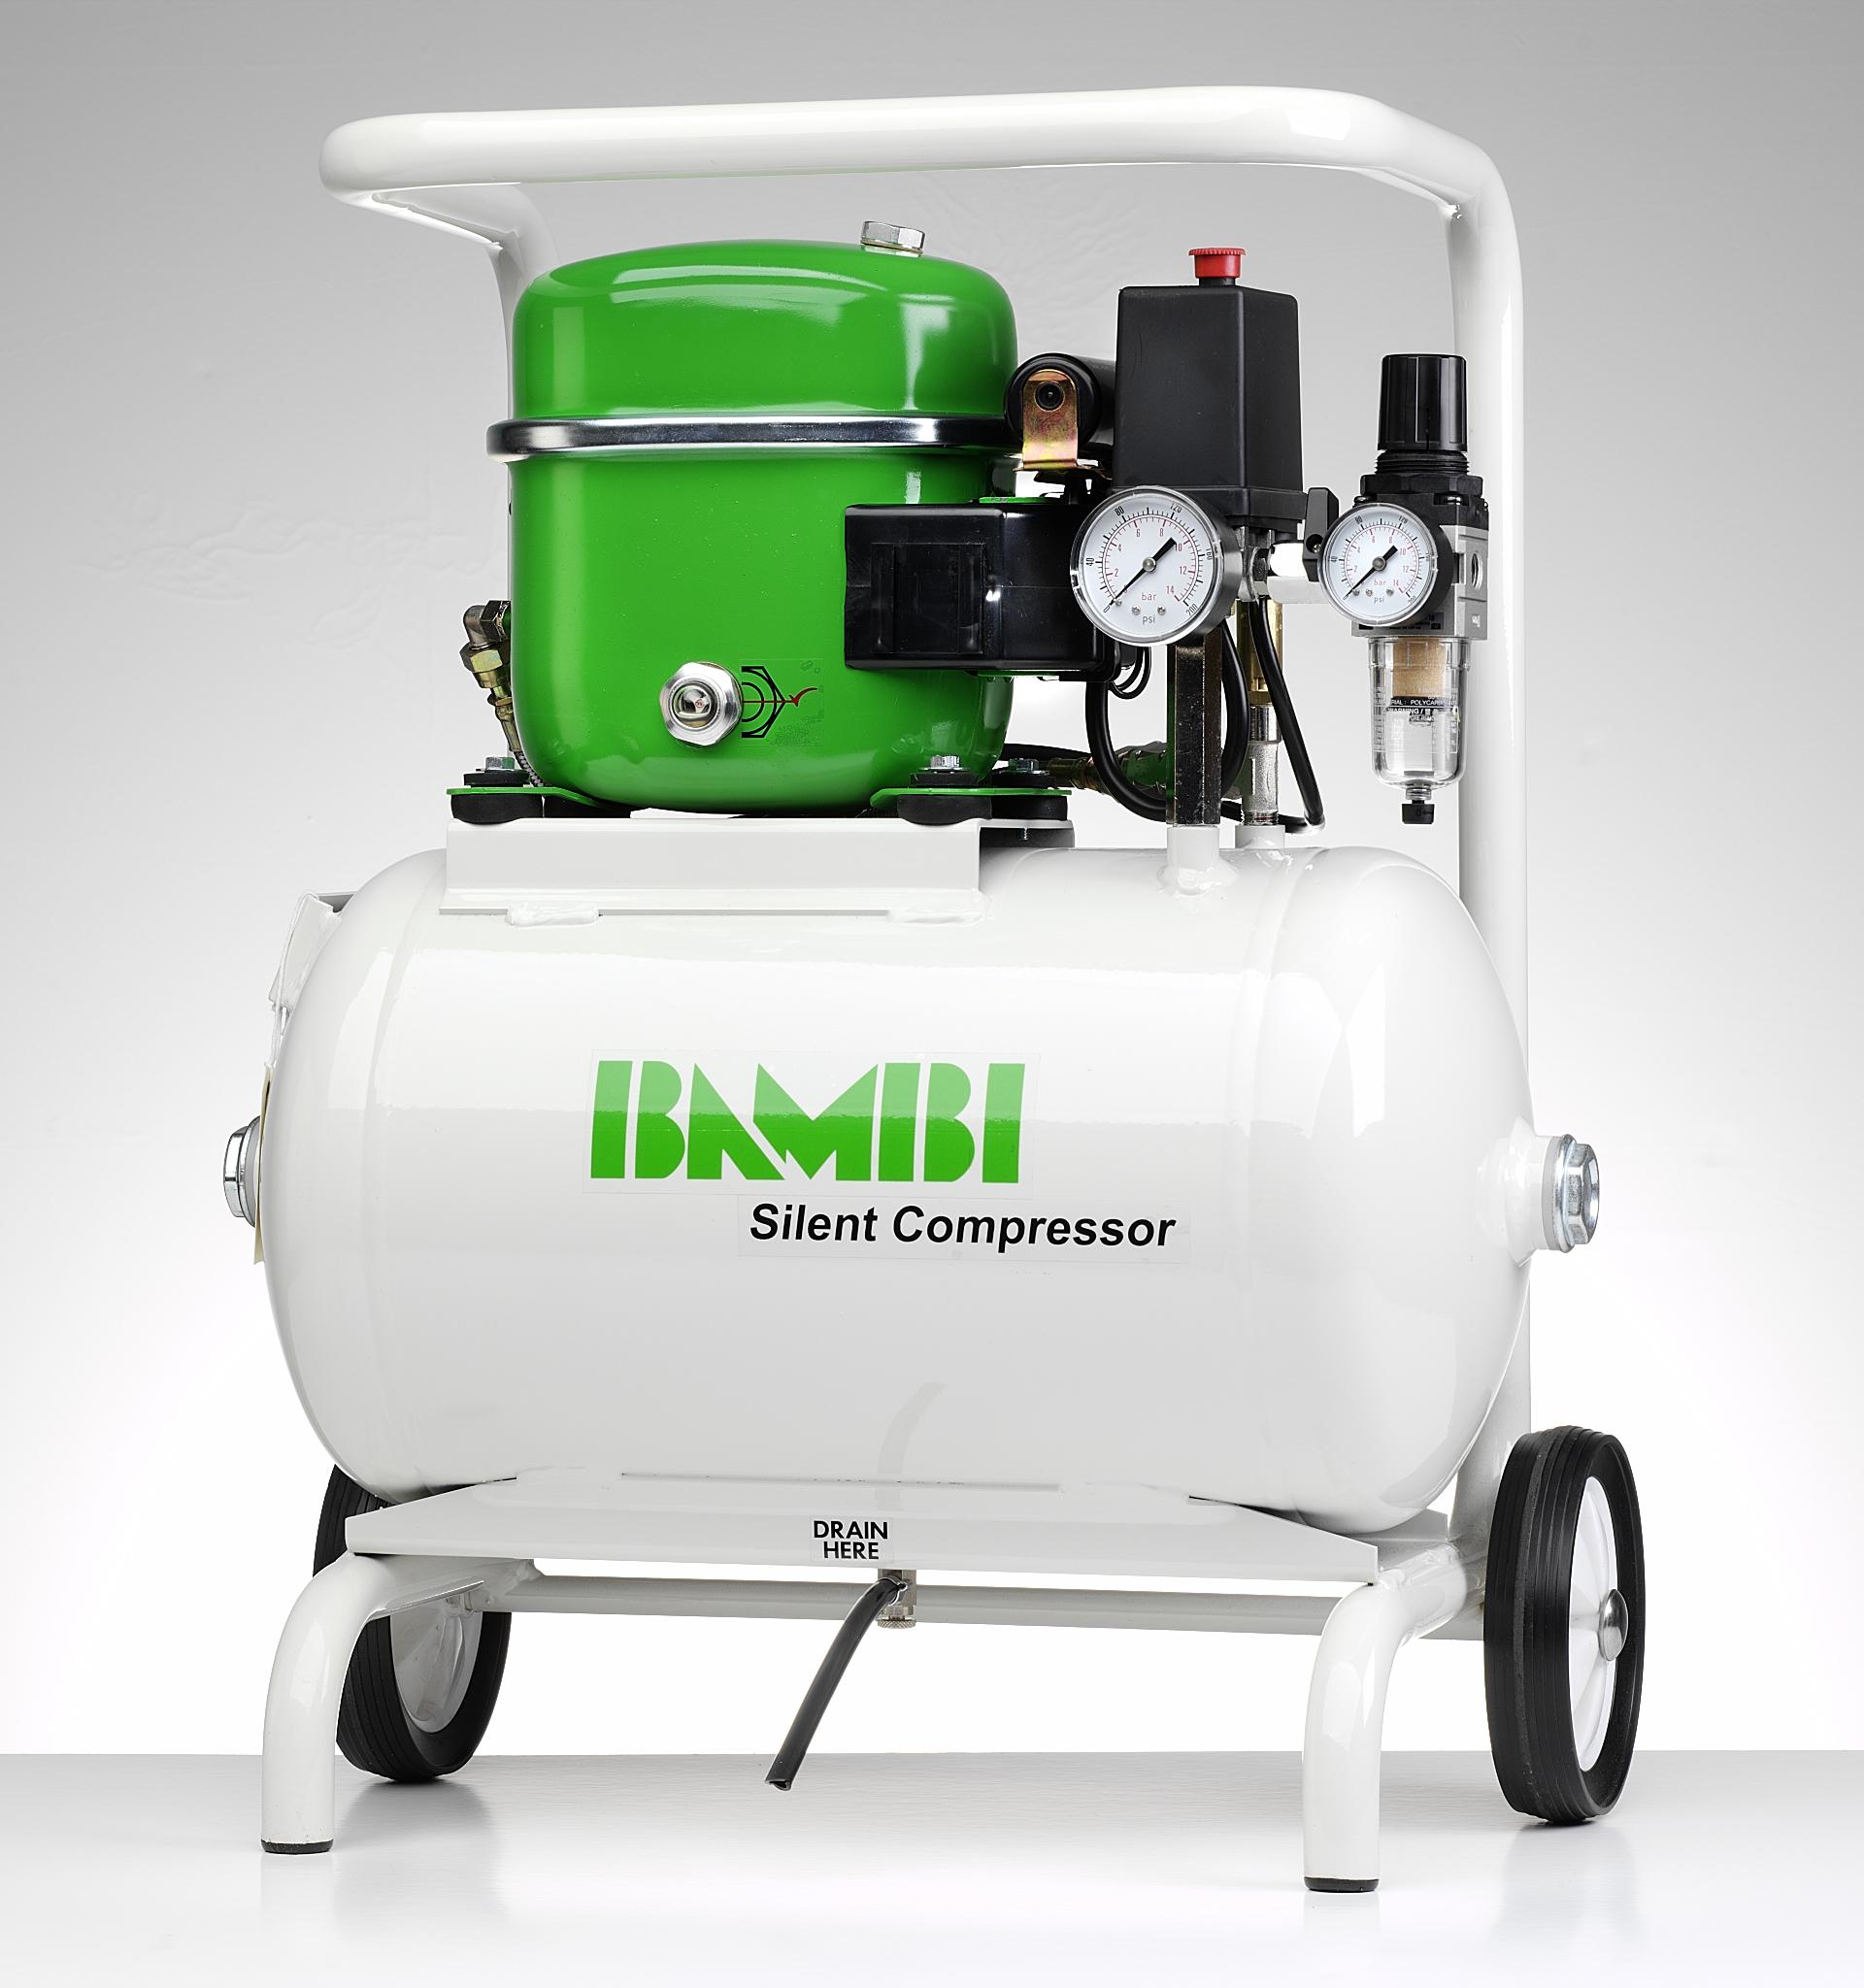 Bambi 0 5hp 15lt Oil Lubricated Air Compressor Dublin